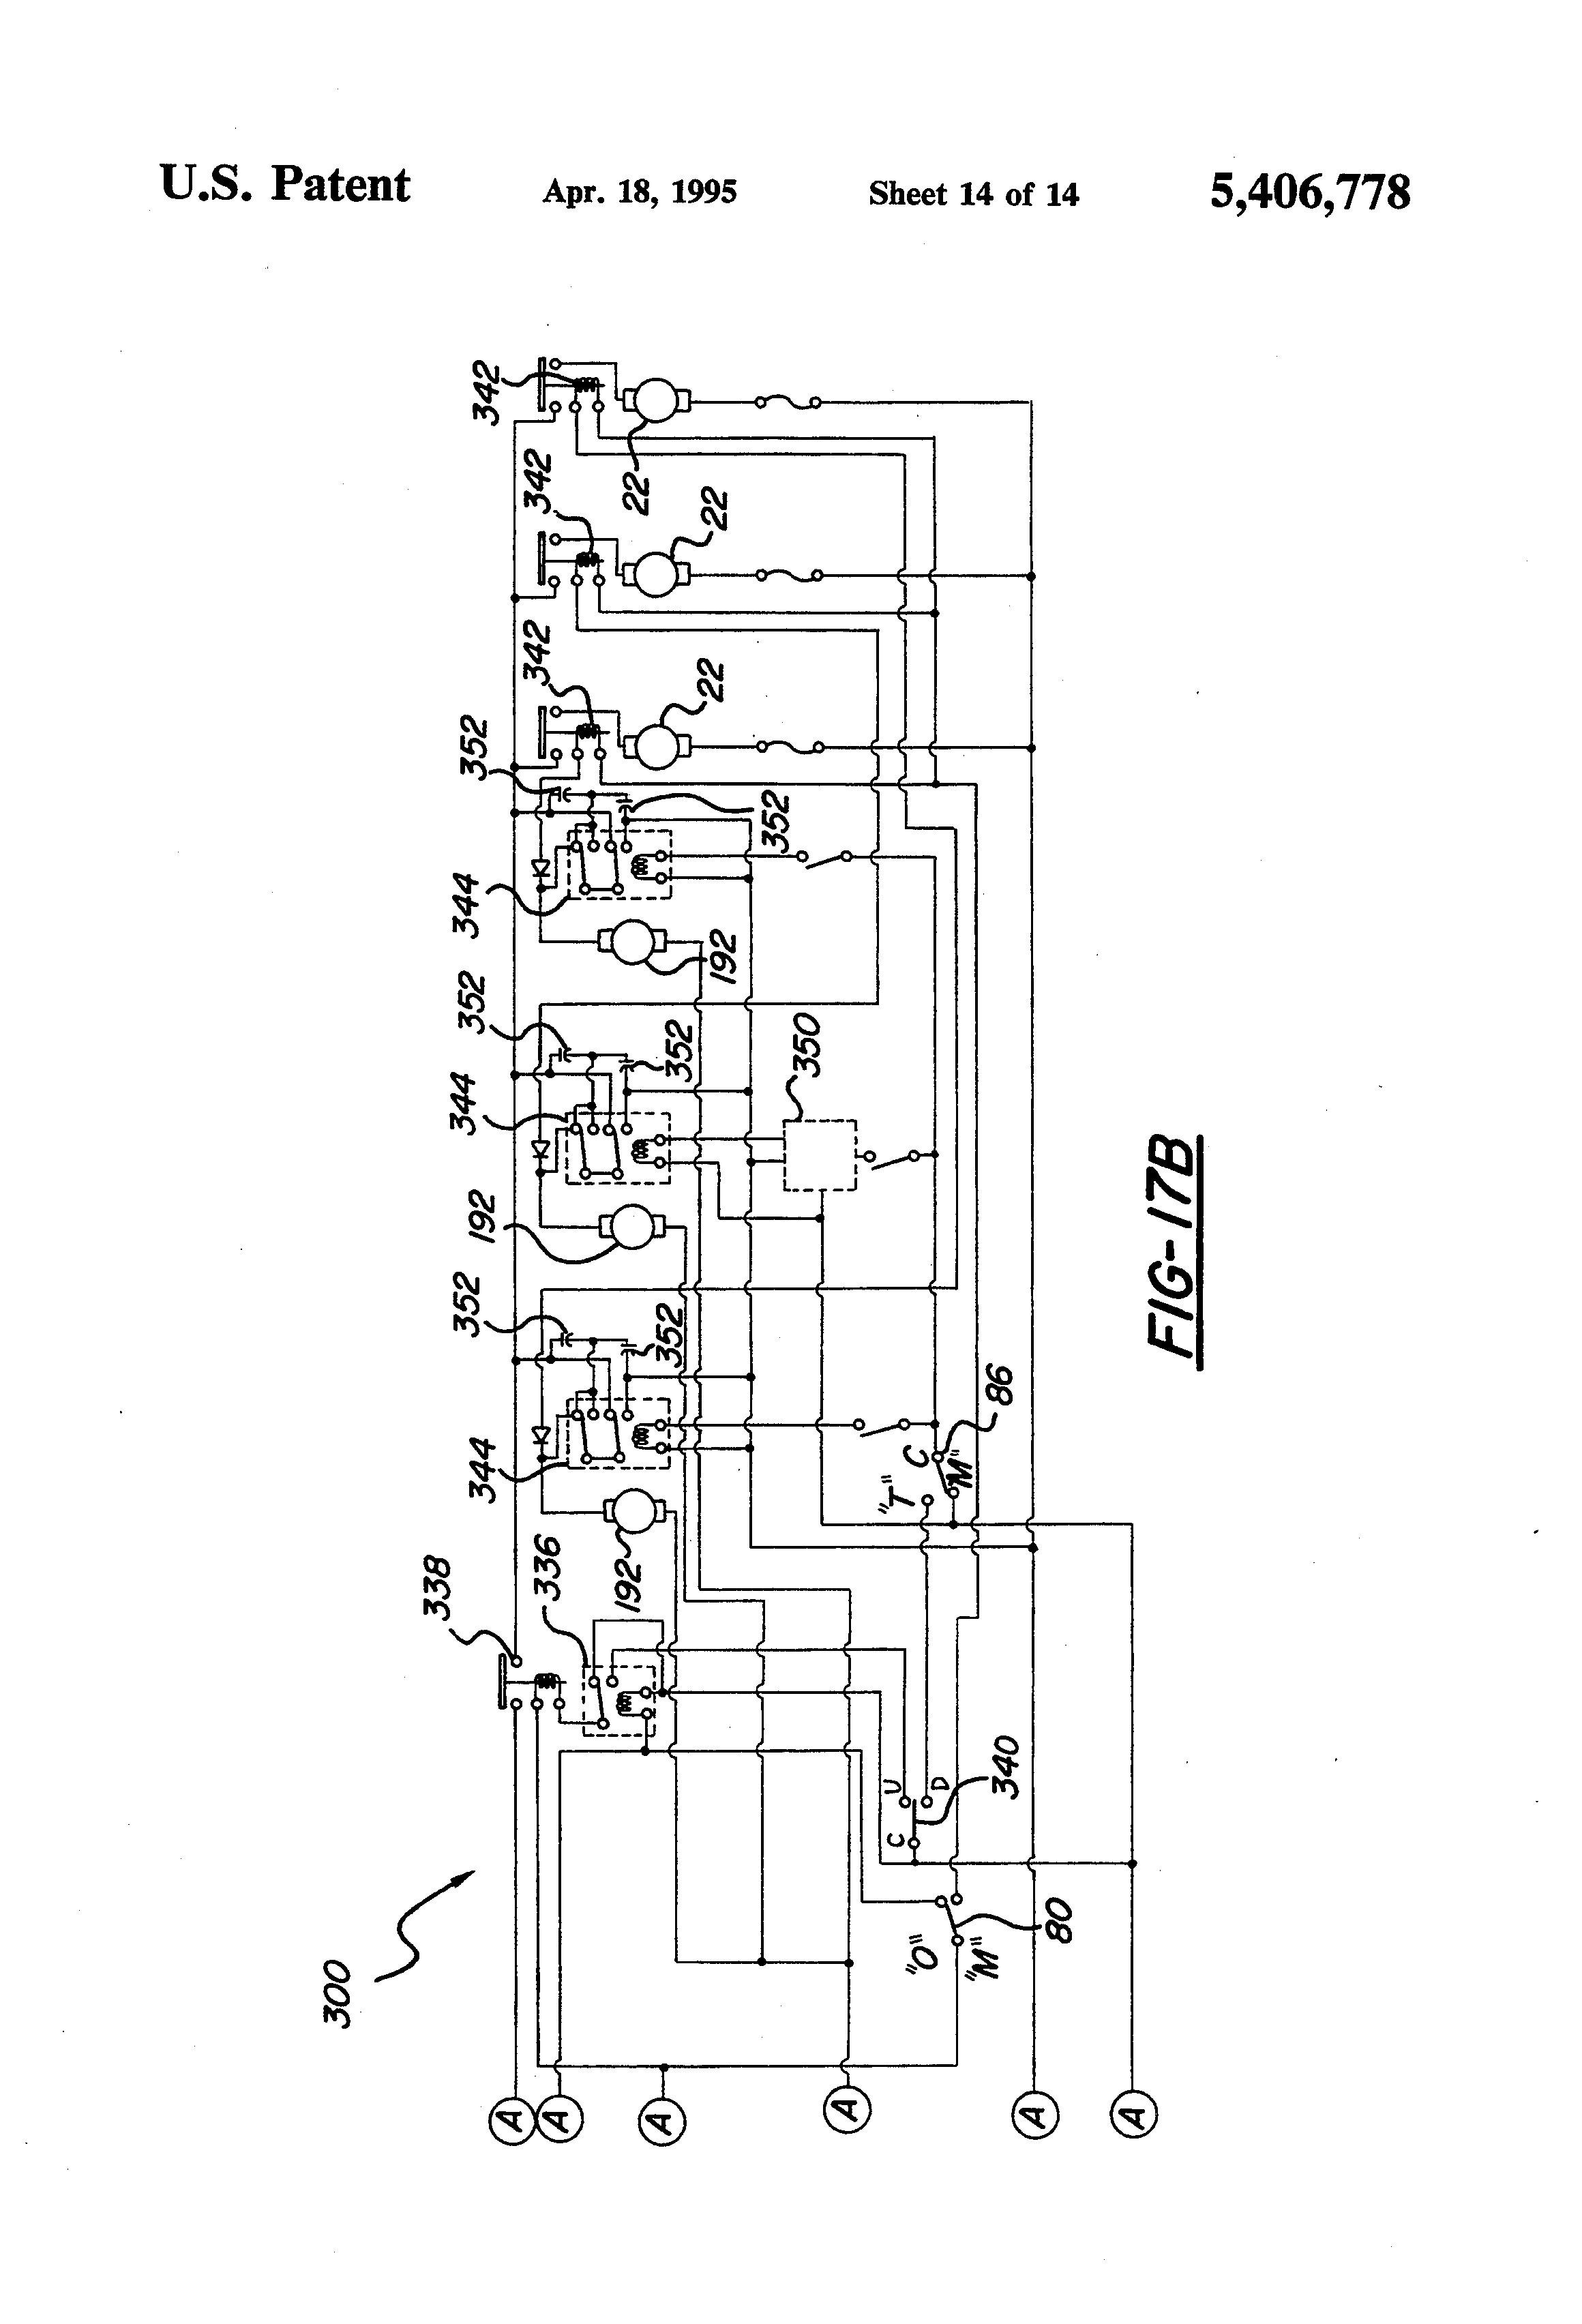 Dixie Chopper Engine to Deck Belt Diagram Dixie Chopper Mower Wiring Diagram Another Blog About Wiring Diagram •